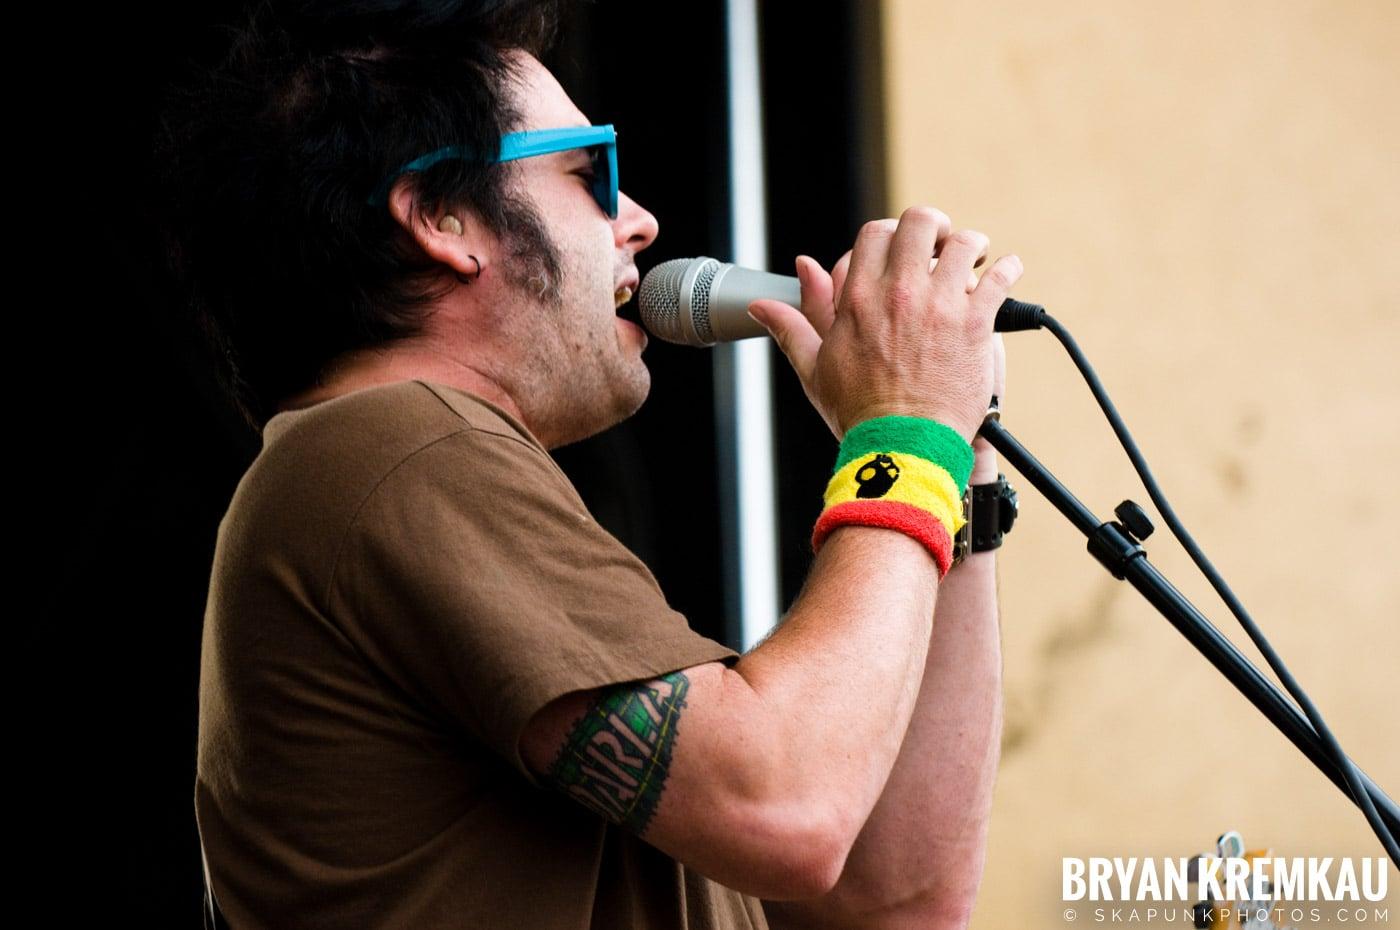 NOFX @ Warped Tour 2009, Scranton PA - 07.15.09 (5)